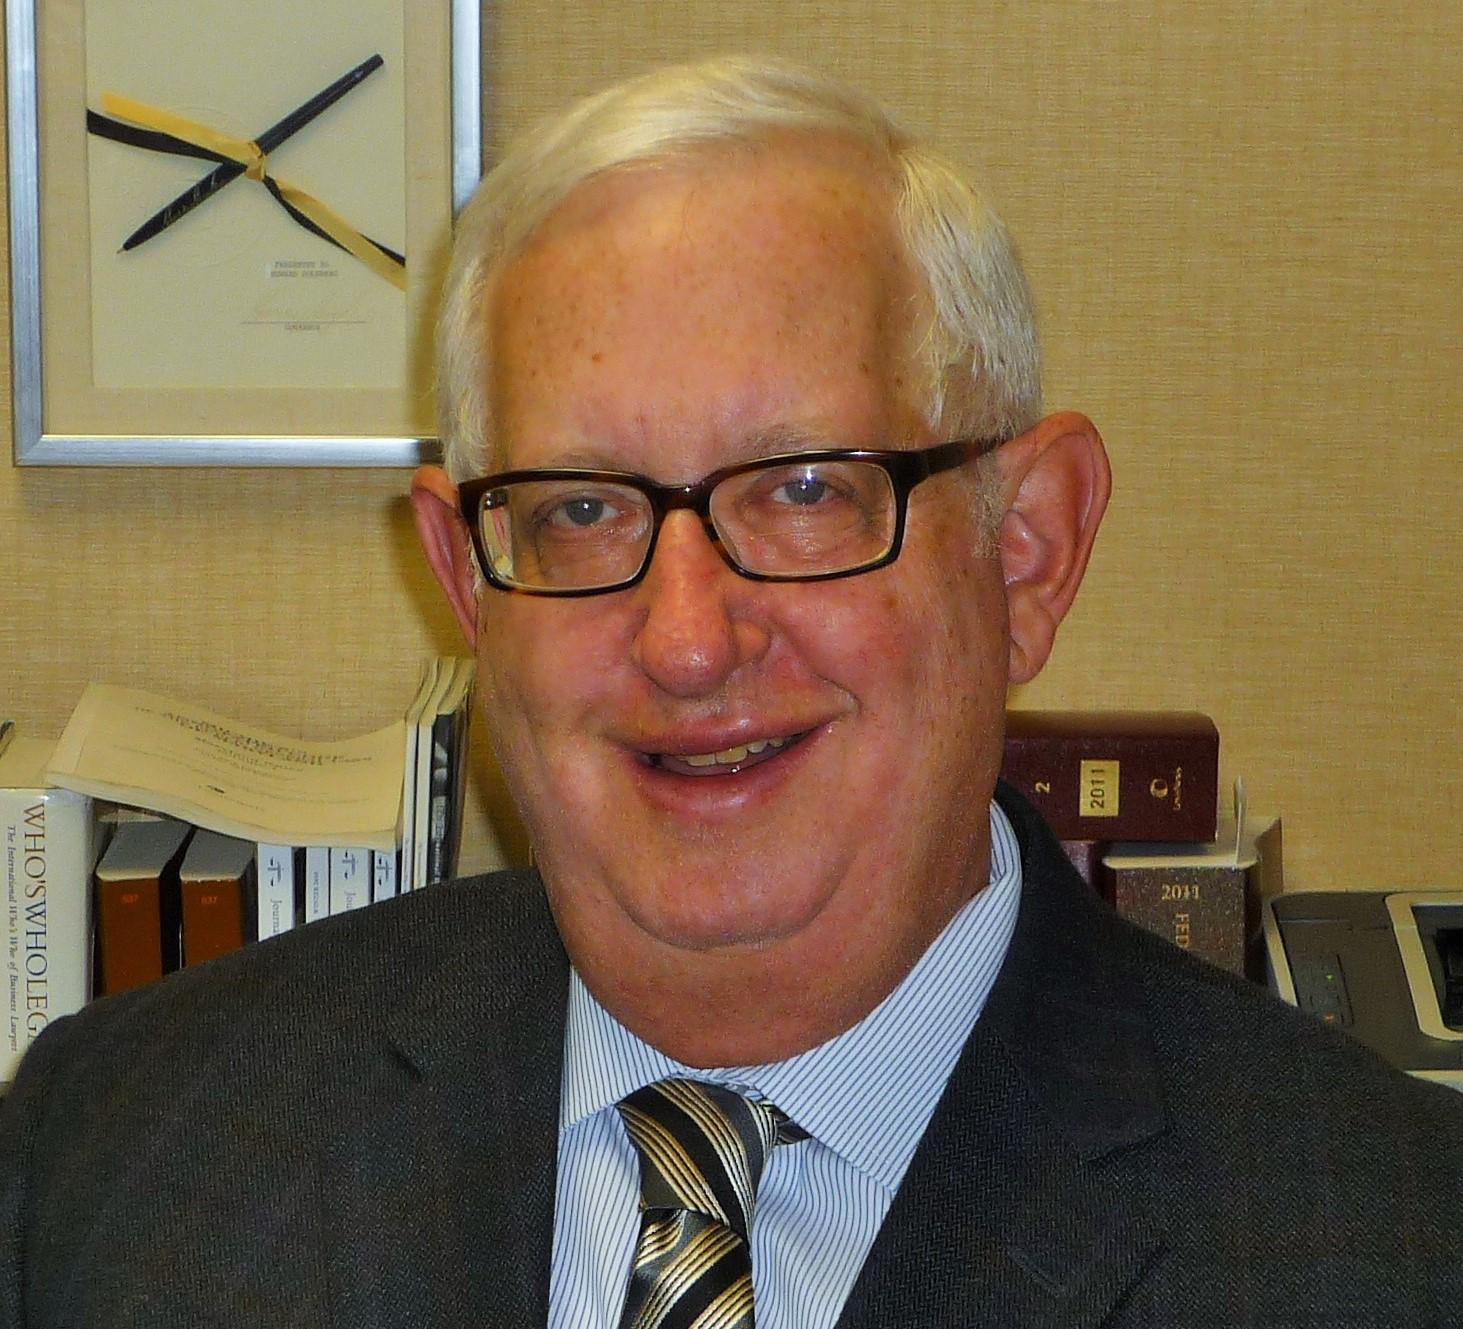 Howard Gary Goldberg